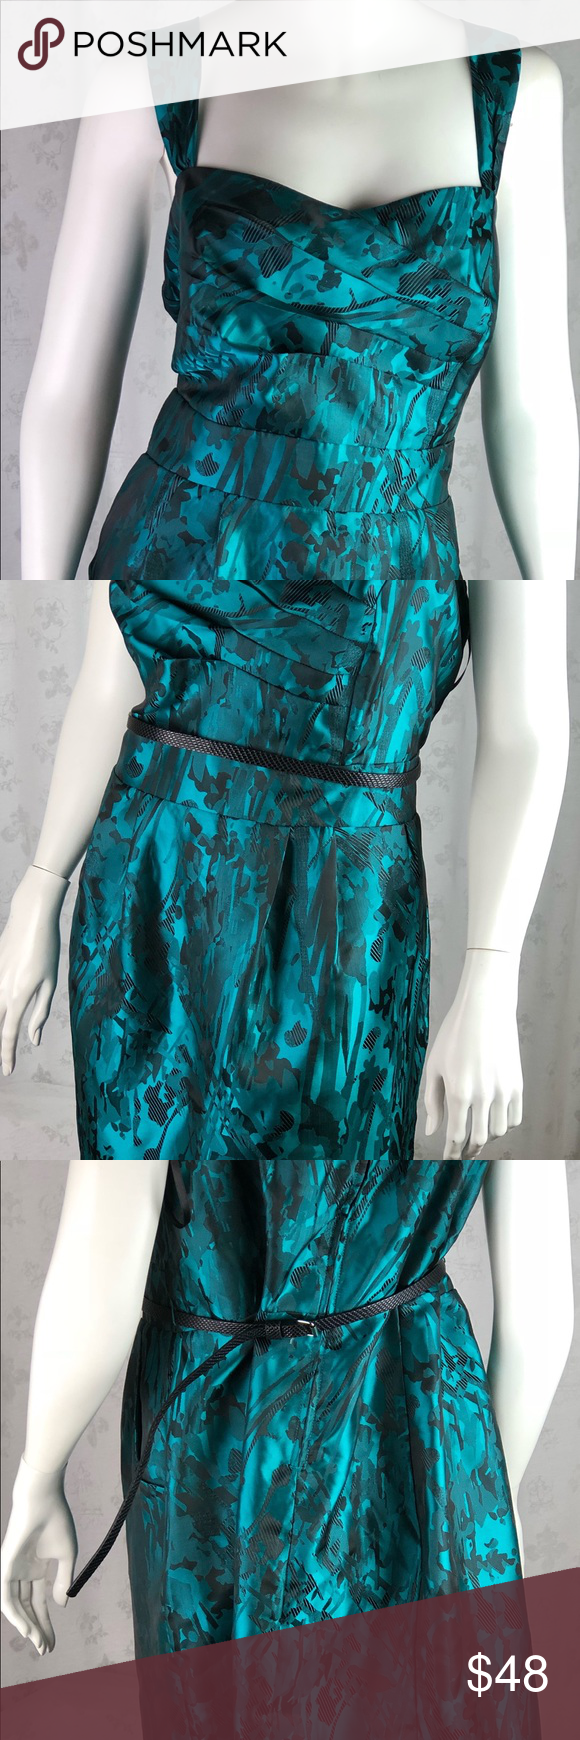 Torrid Teal Dress | Teal dresses, Torrid and Teal